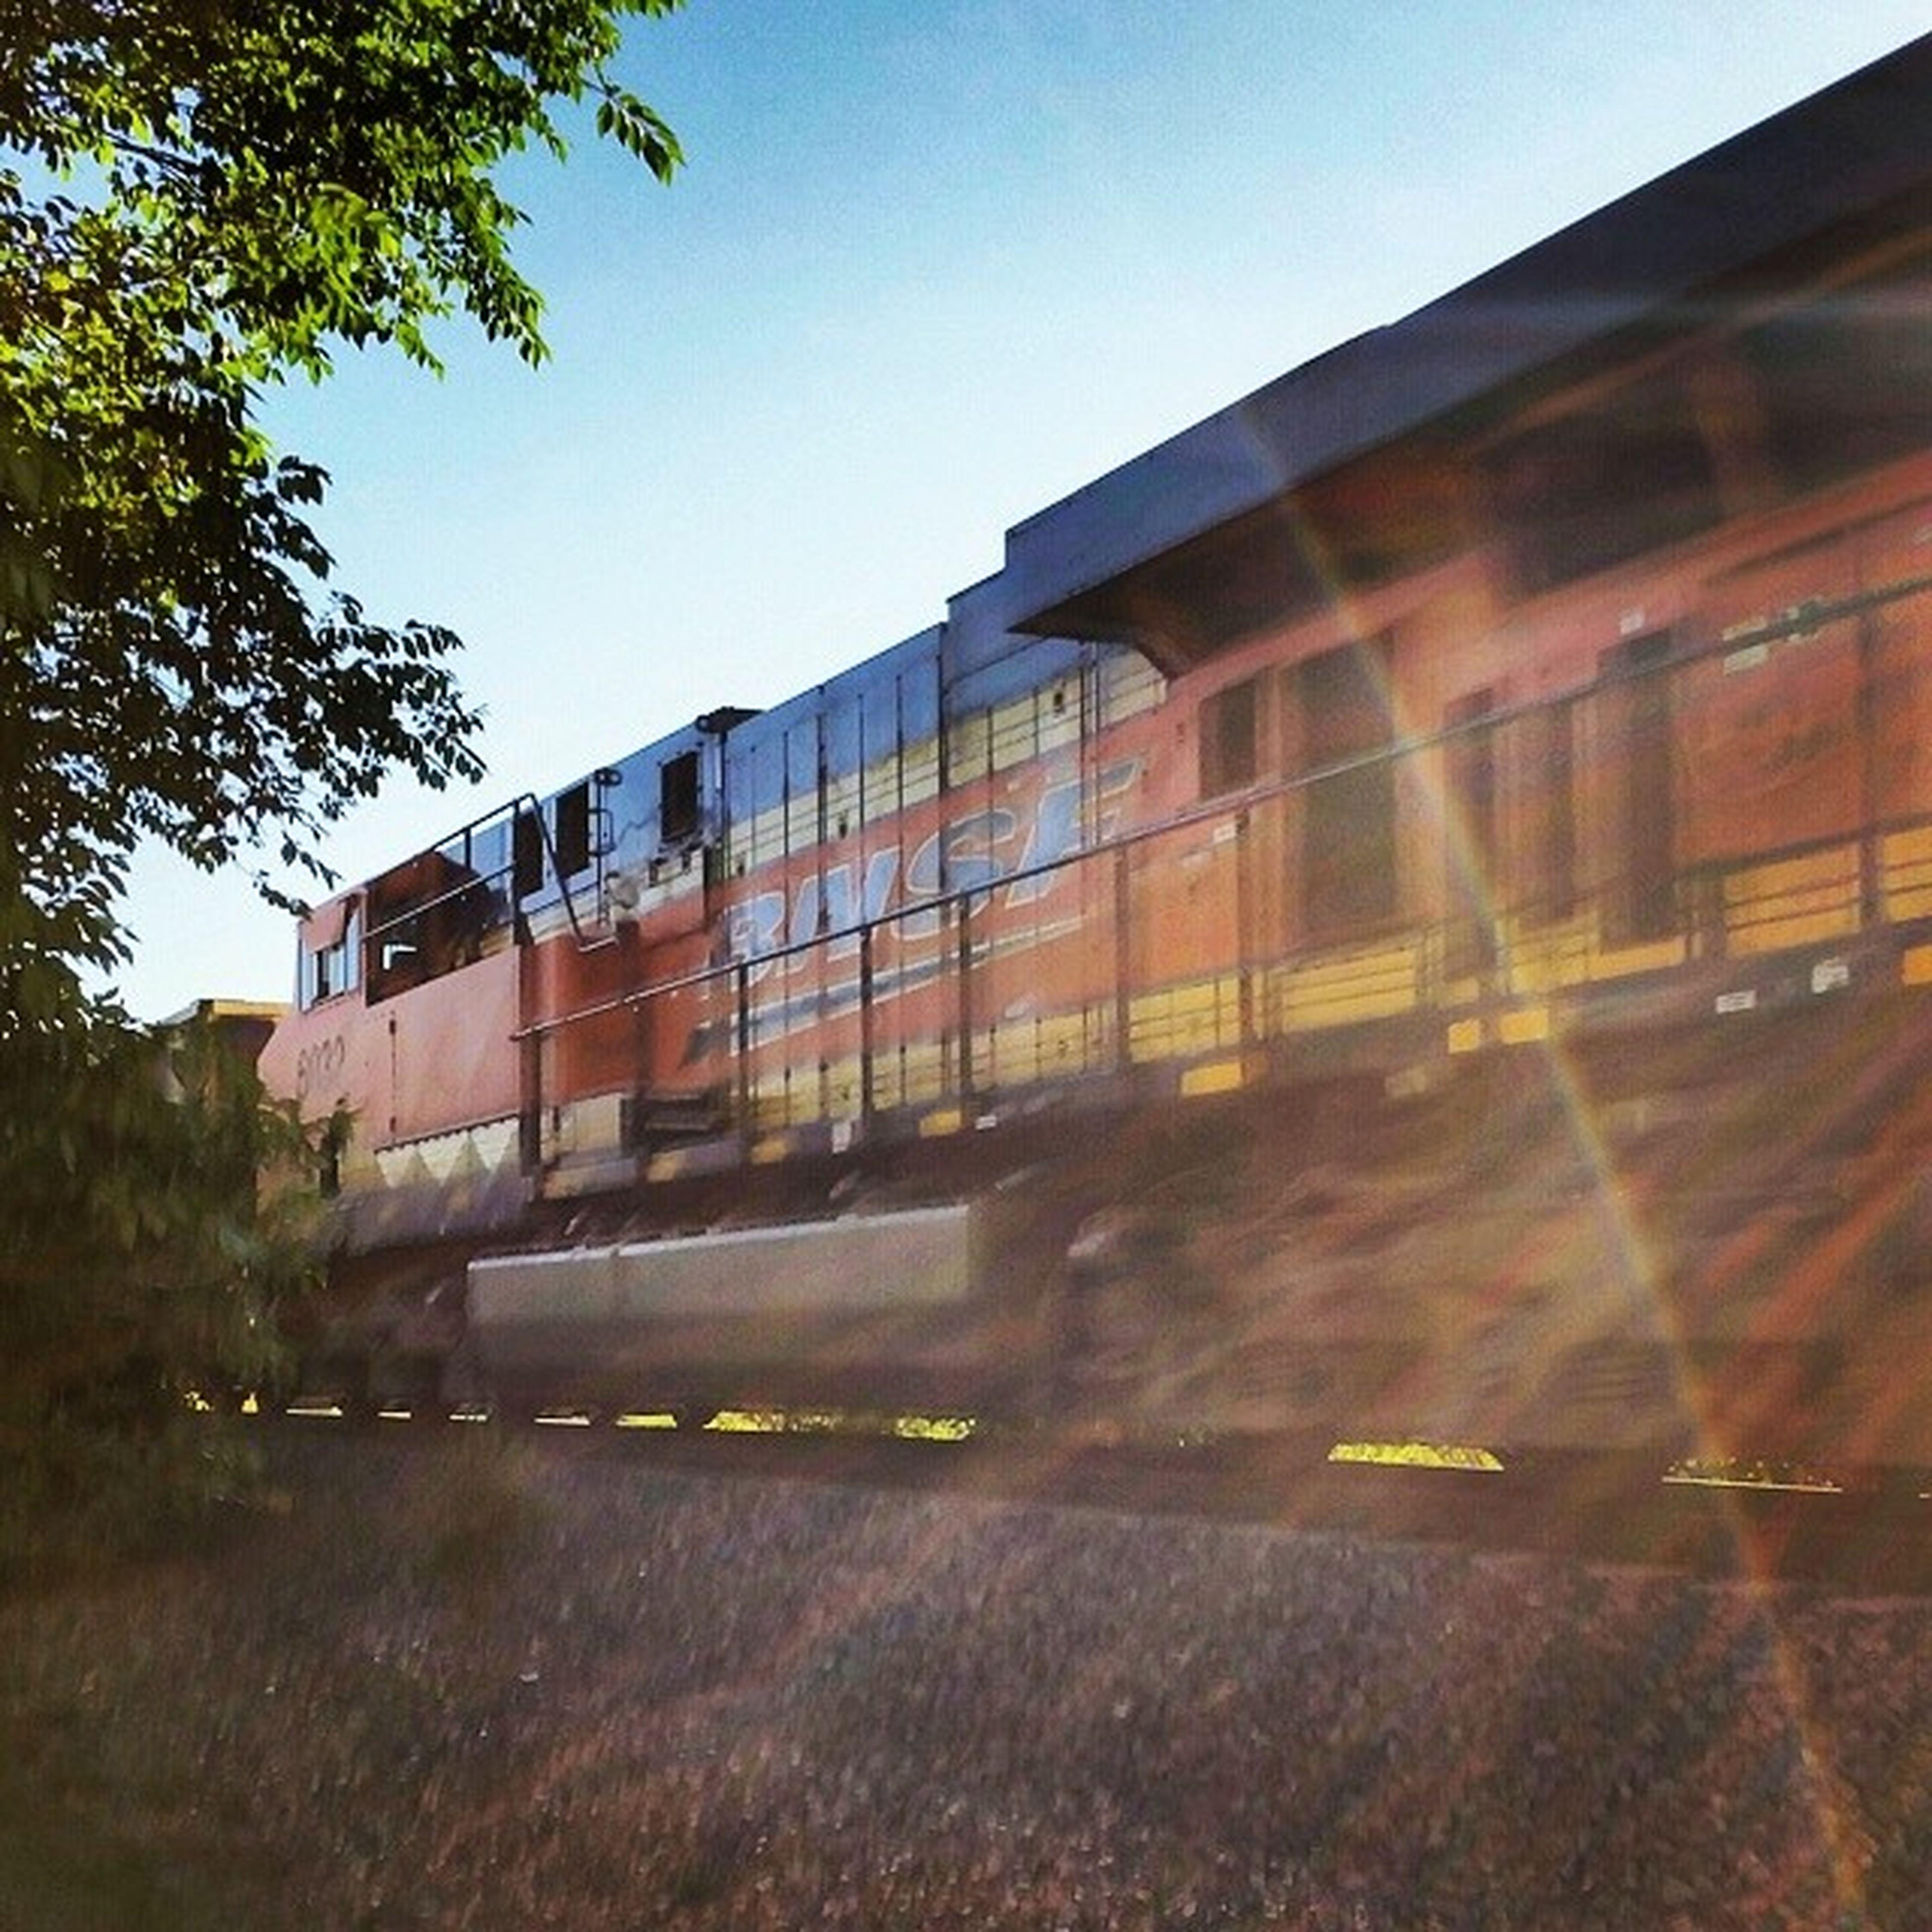 Colorado Express USA Colorado Colorado _ Springs Bluesky Trees Greenery Sunburst GOD _ RAYS Train Coors_Train